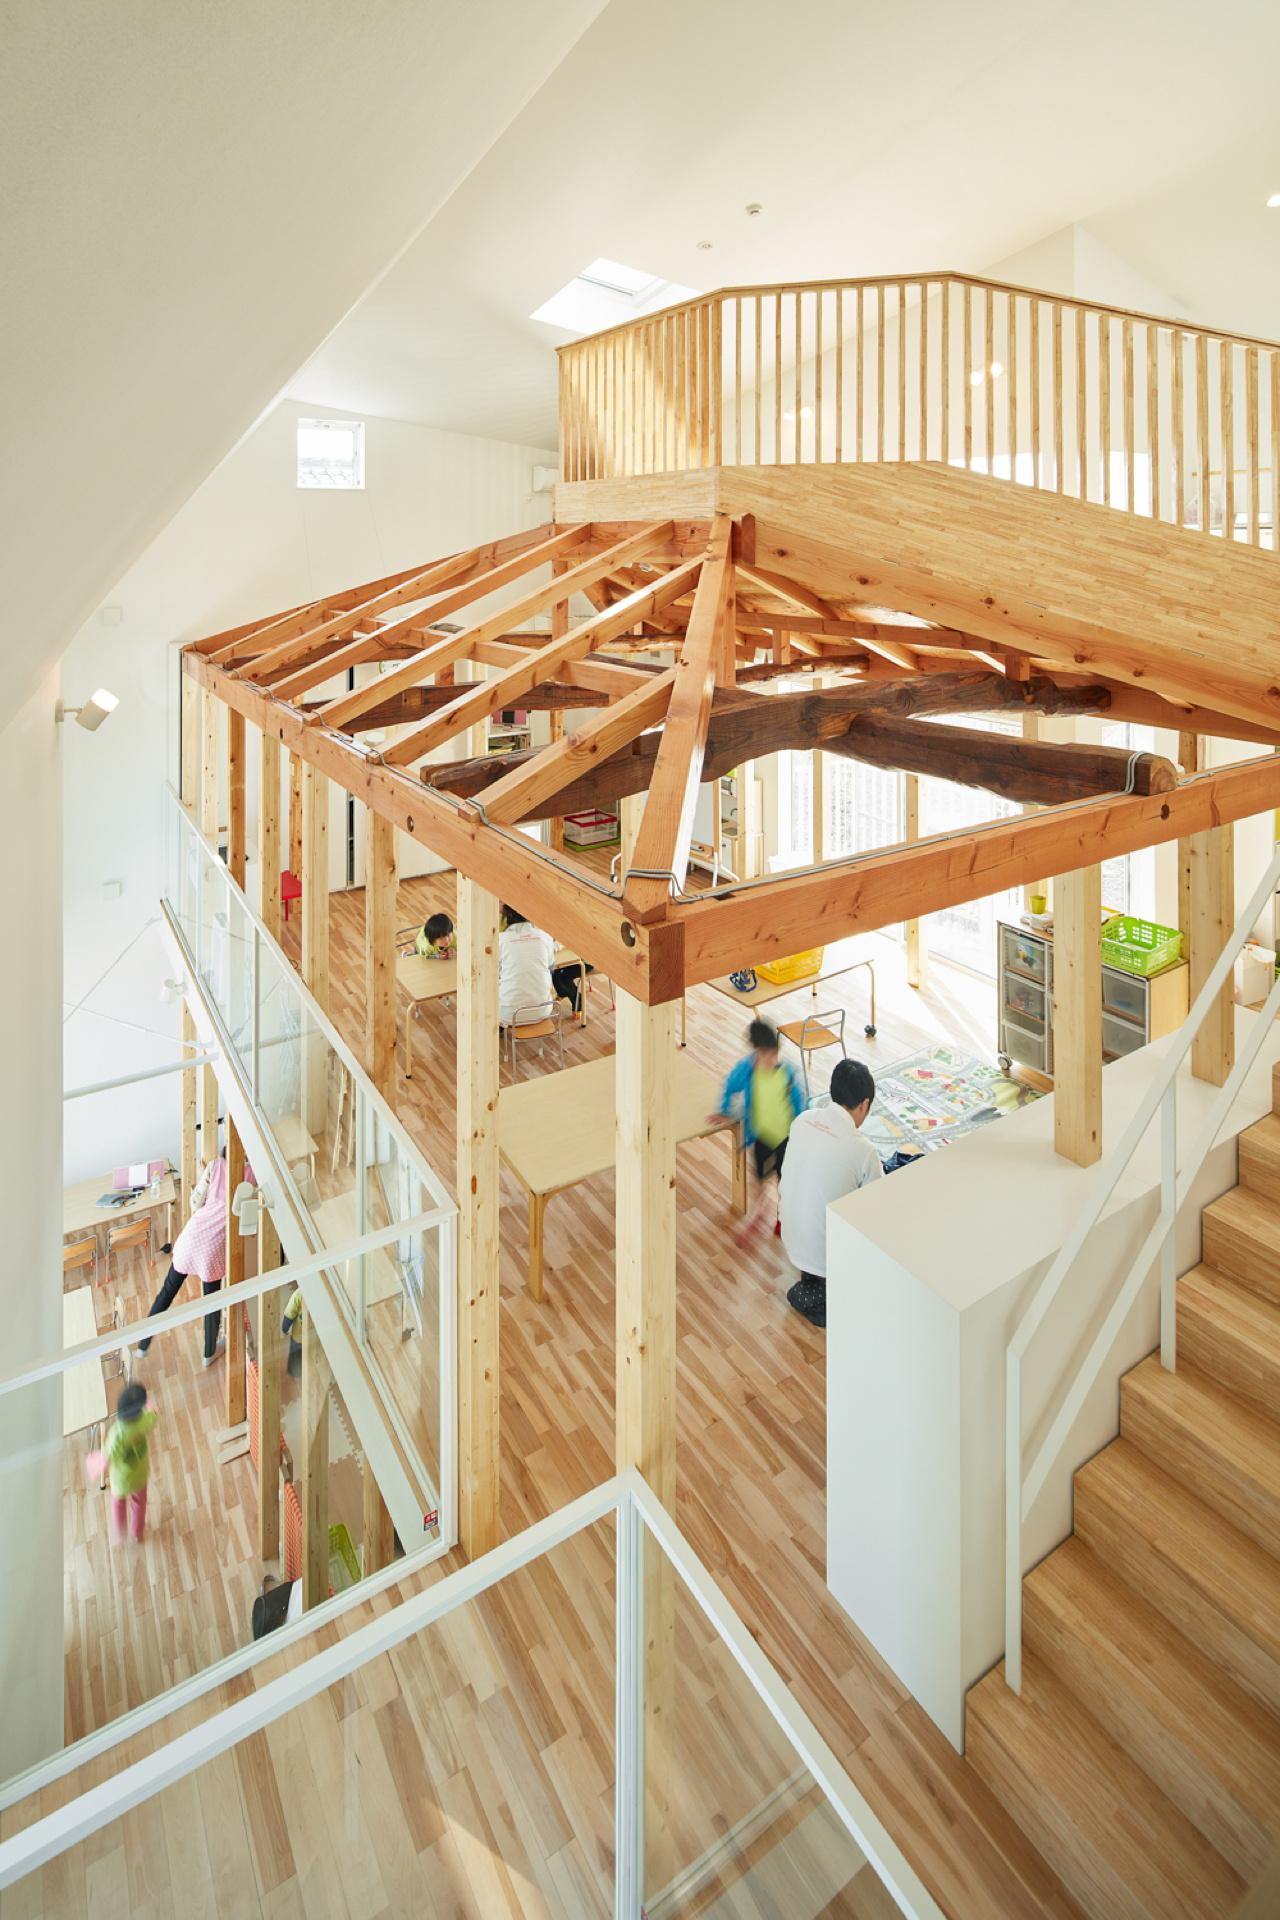 MAD Architects: Clover House, scuola materna, a Okazaki, Giappone